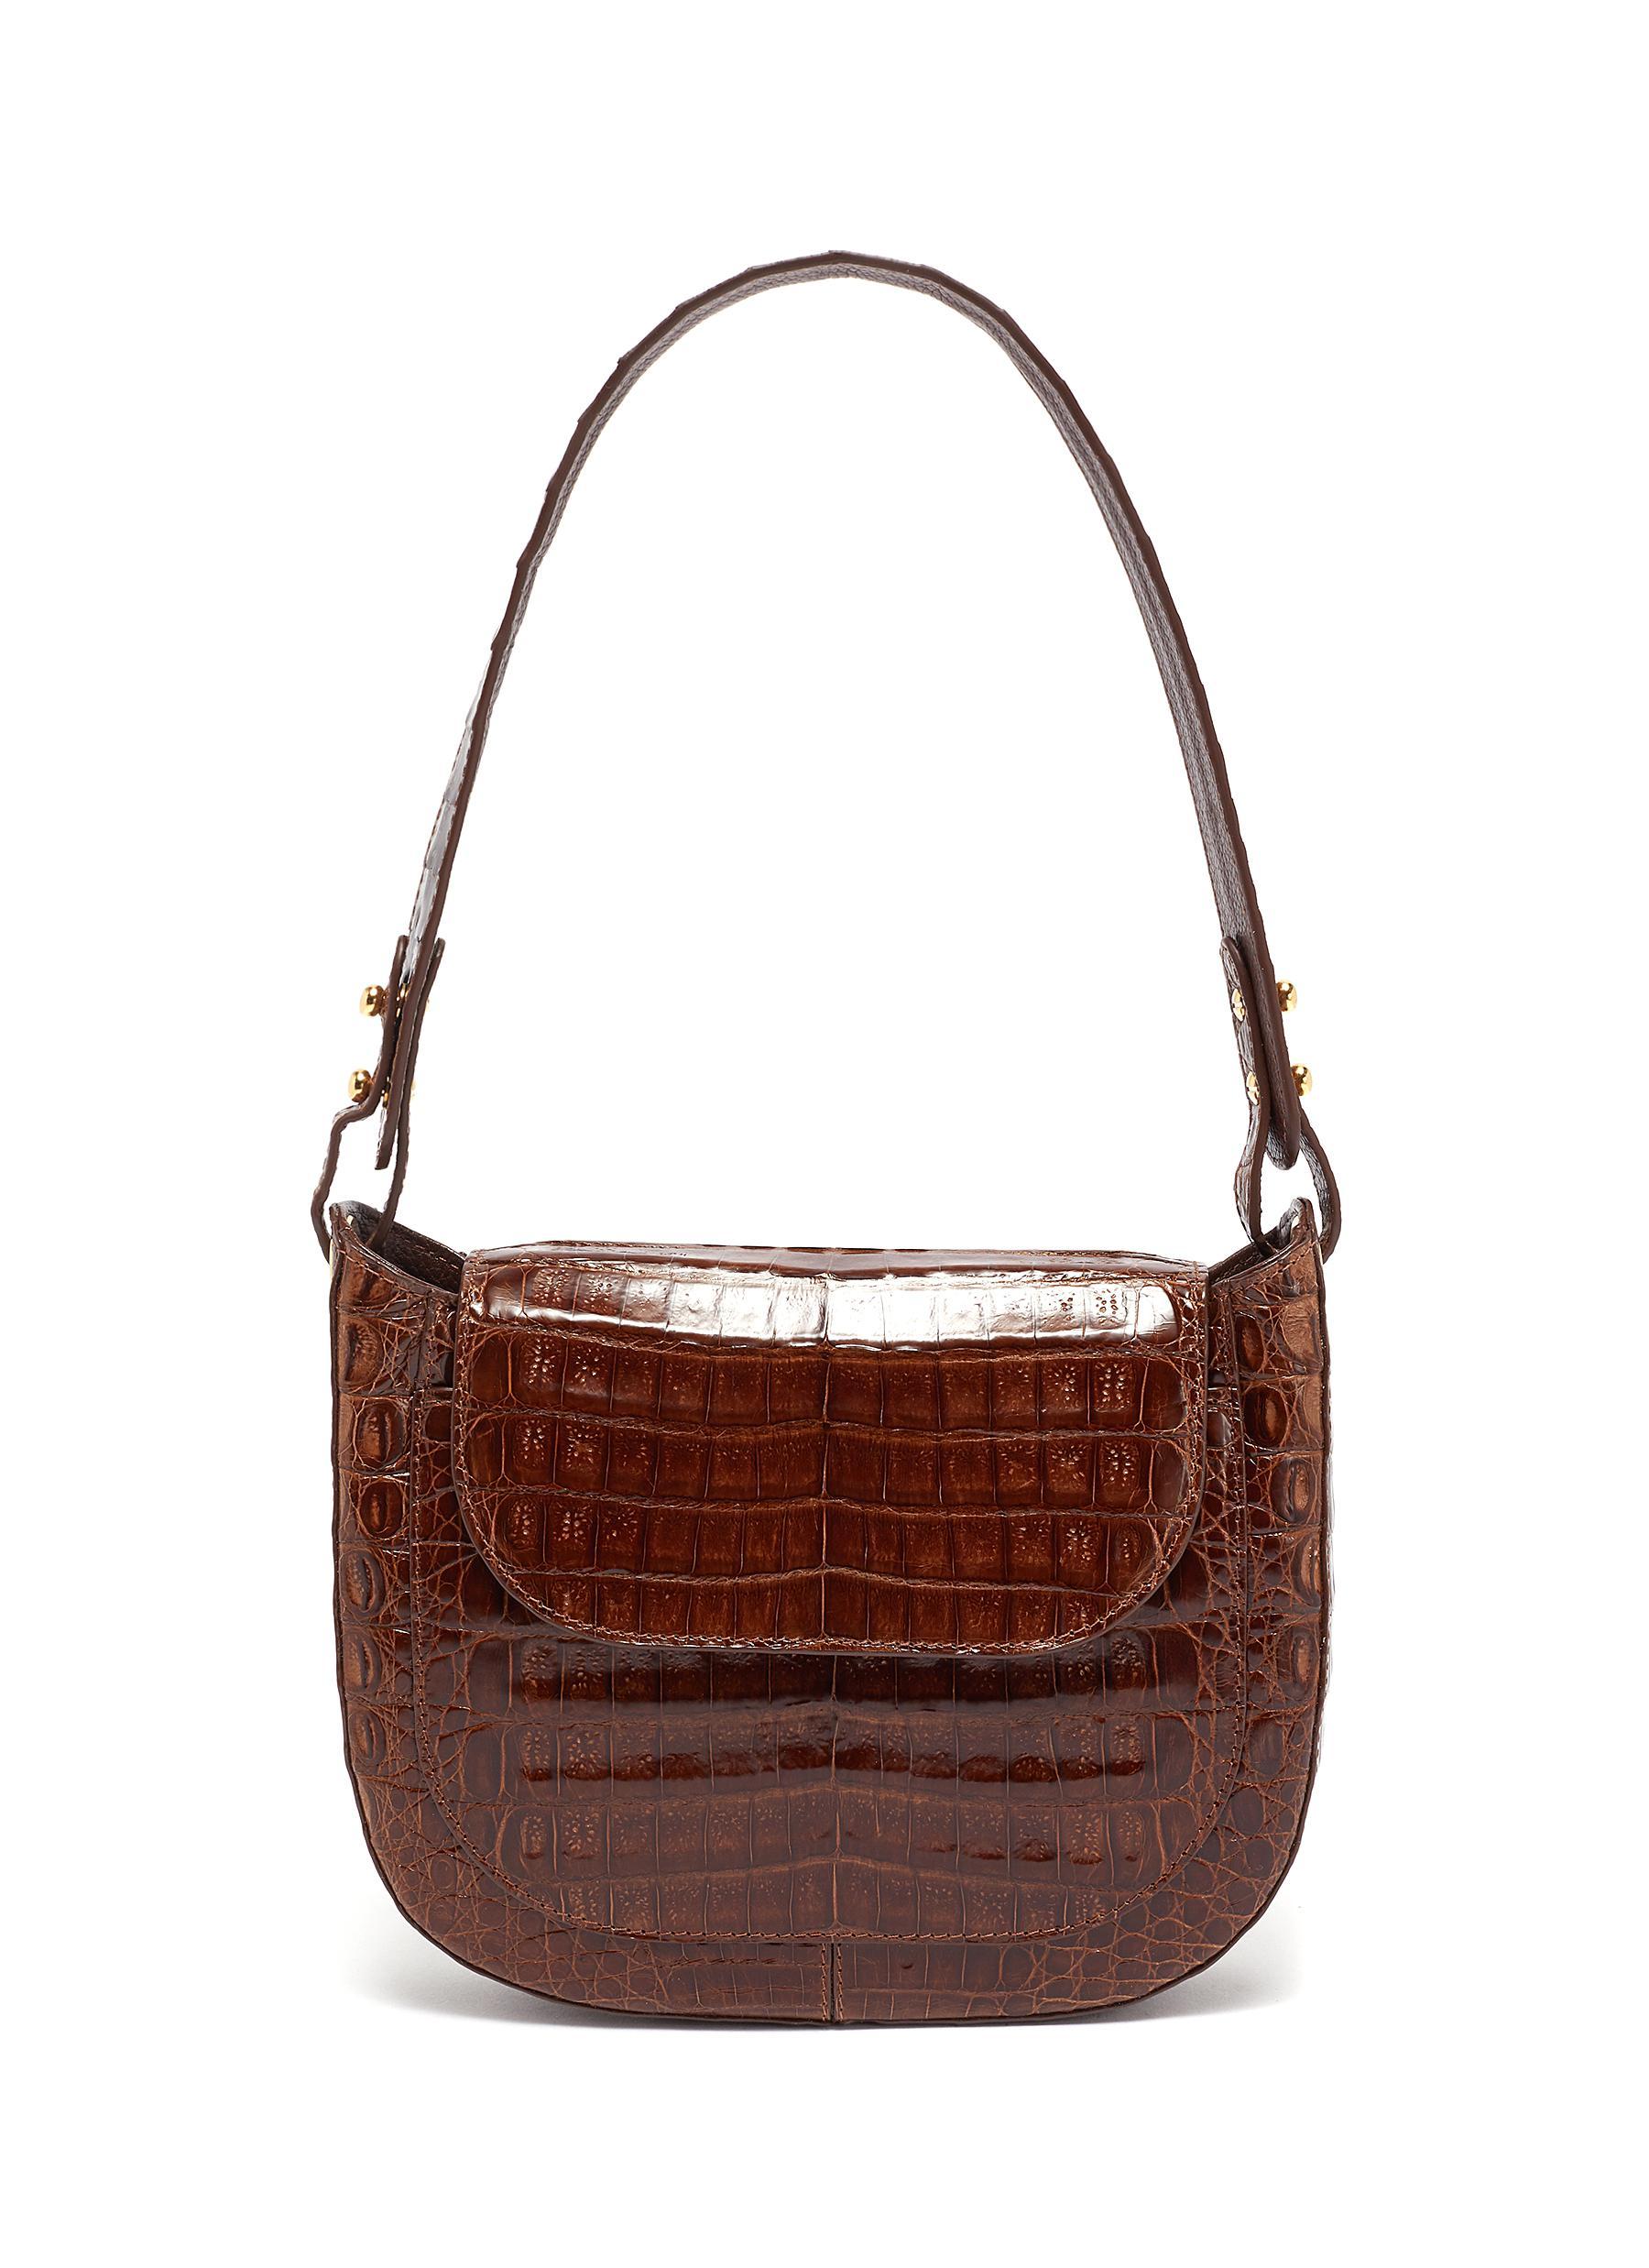 Olympia' Glaze Crocodile Leather Crossbody Bag